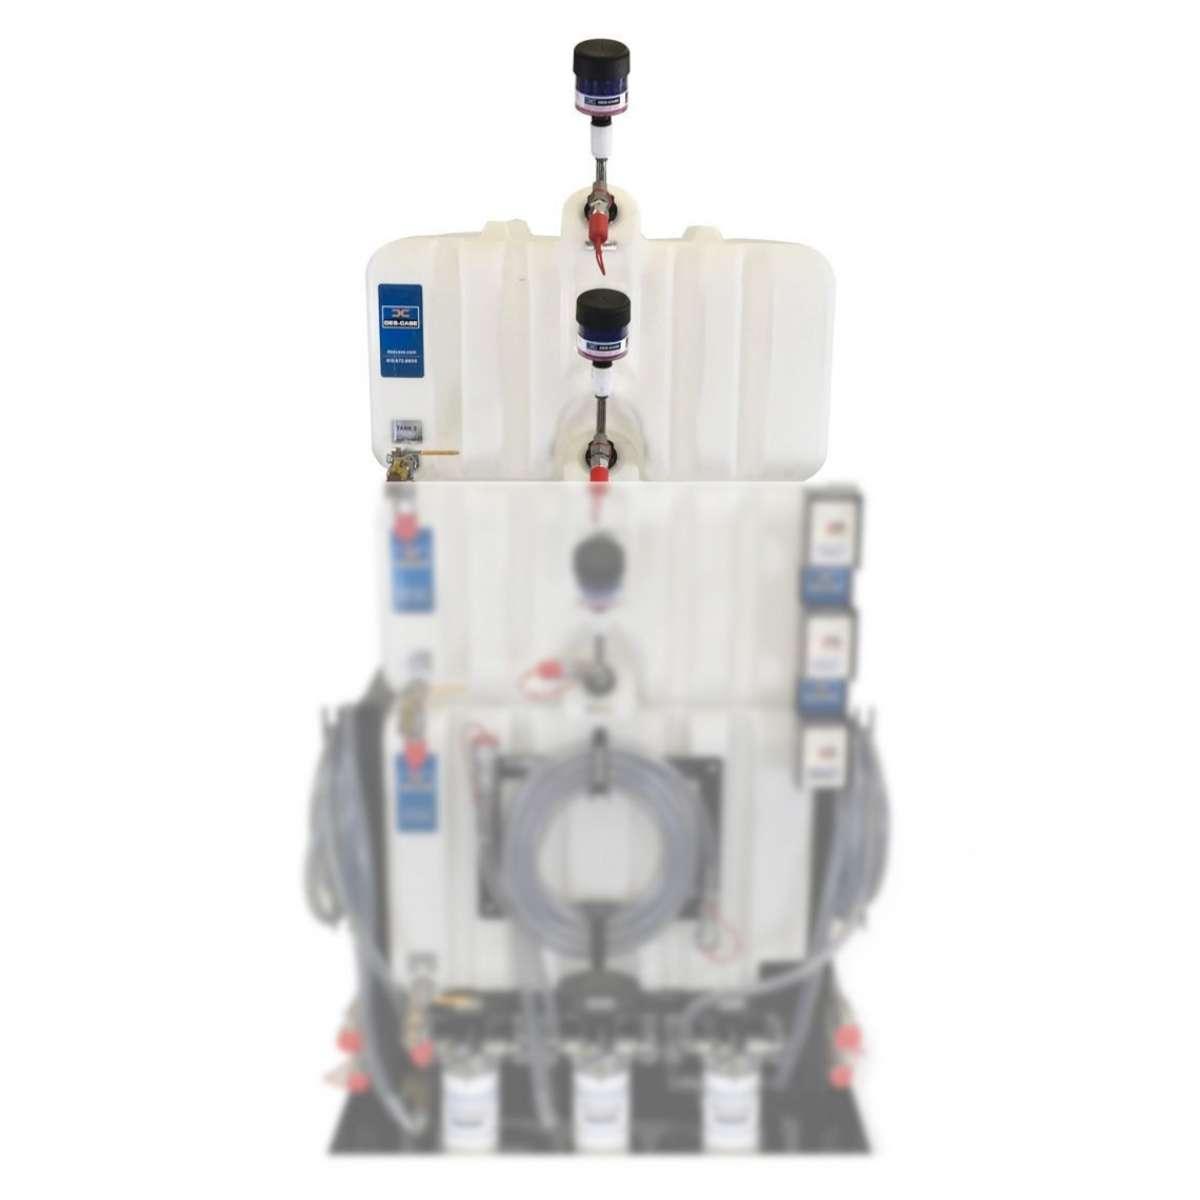 LT Series Lubricant Management System (LT-LMS) - Upper Unit